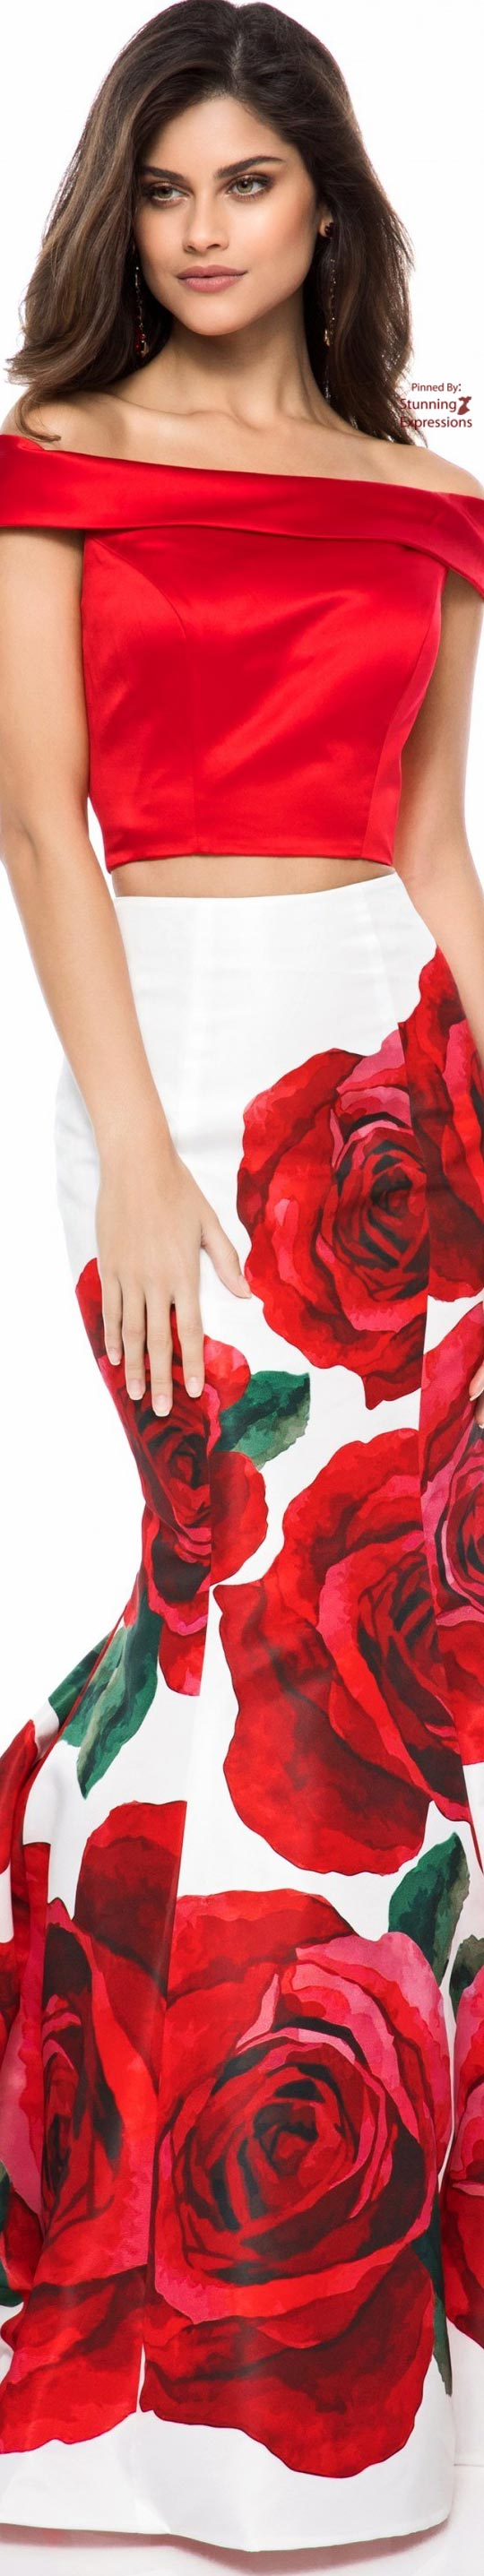 593bea838eb SHERRI HILL 51850 Sherri Hill Spring 2018 Prom Dresses Bella39s